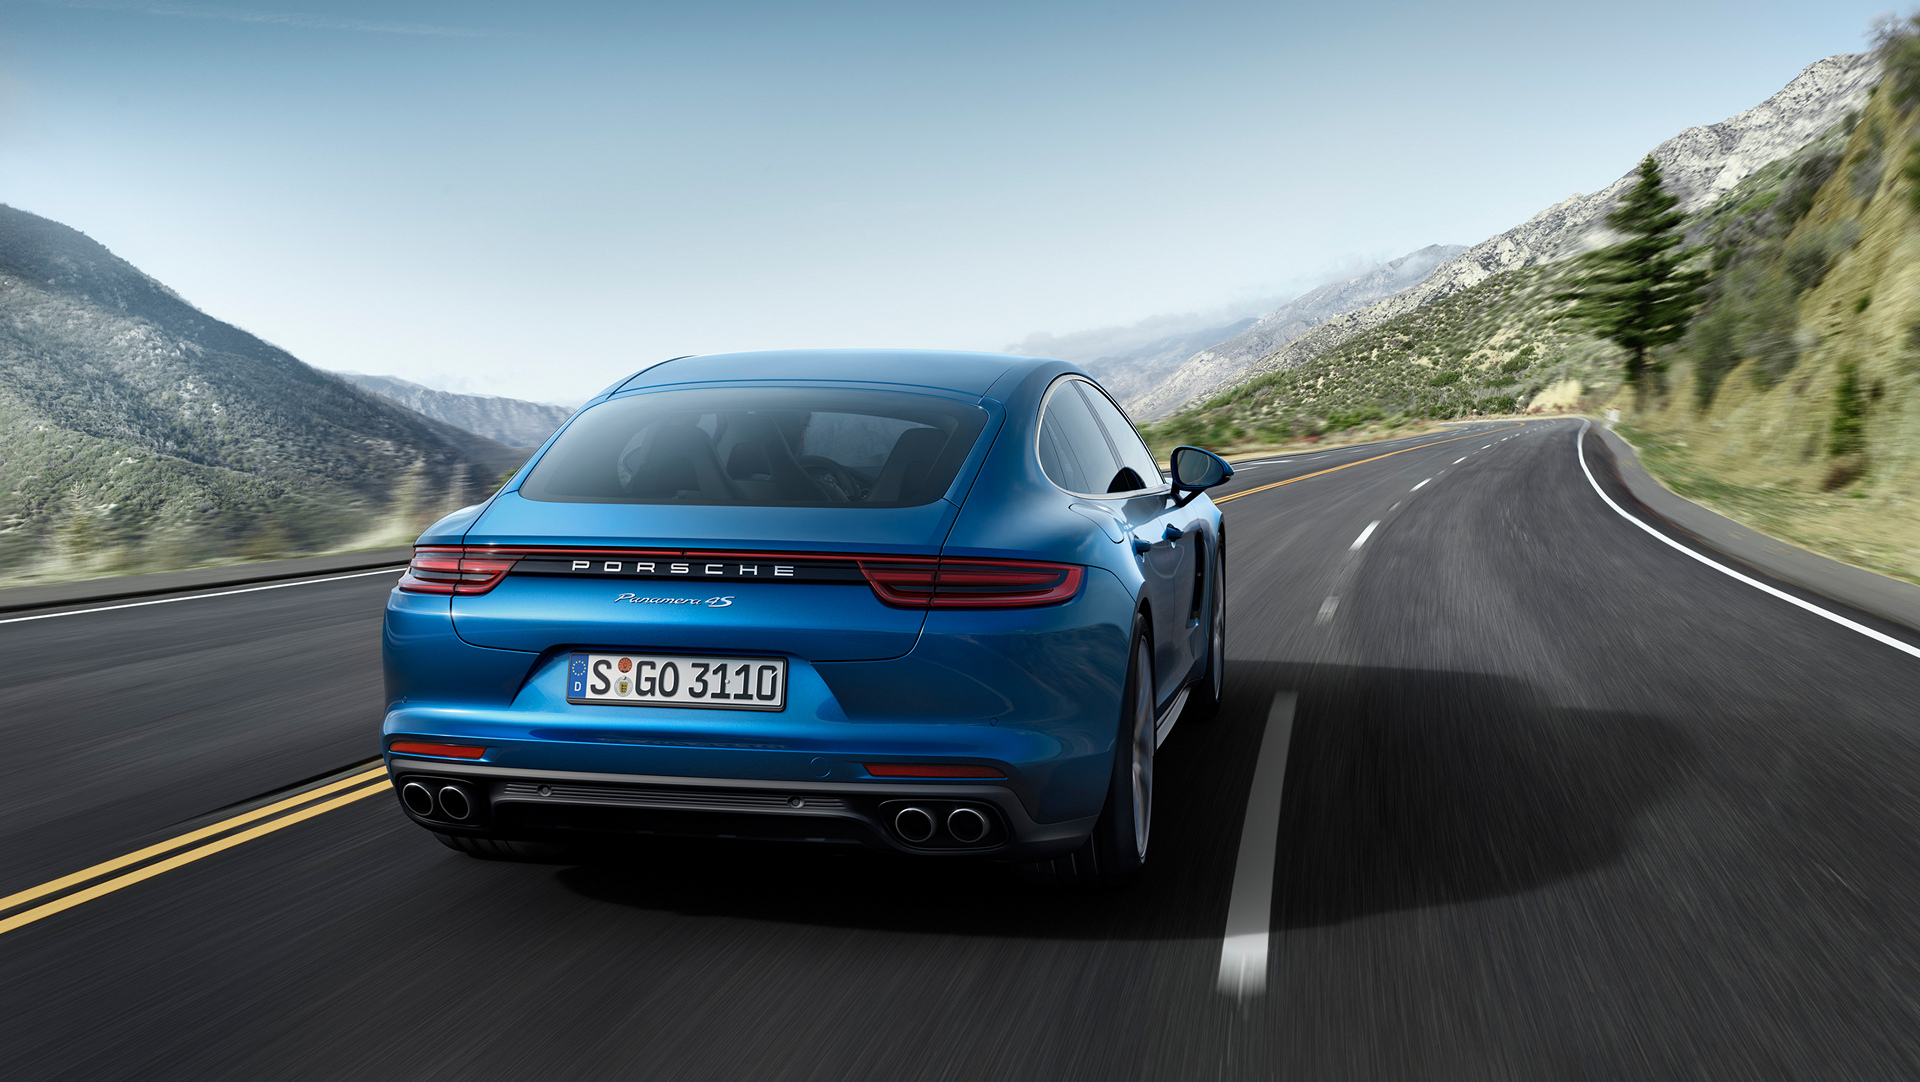 Porsche Panamera 4S © Dr. Ing. h.c. F. Porsche AG